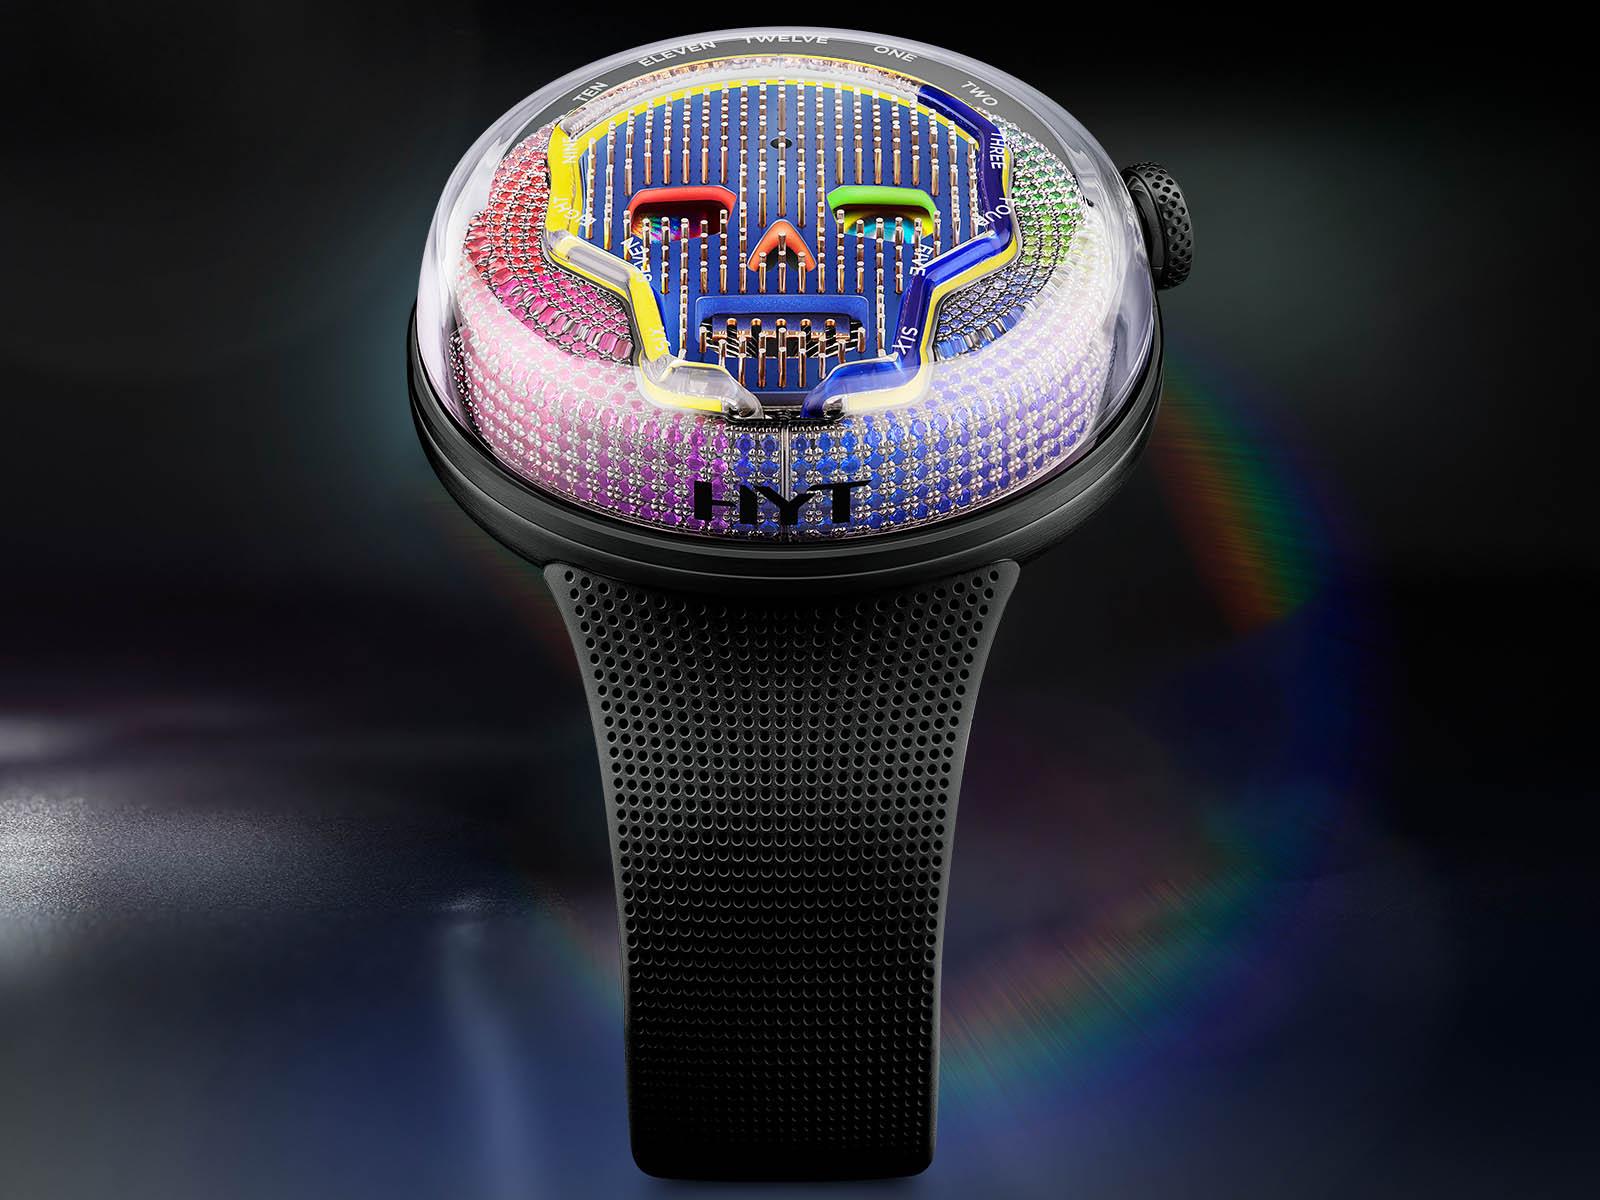 h02513-hyt-soonow-instant-rainbow-3.jpg